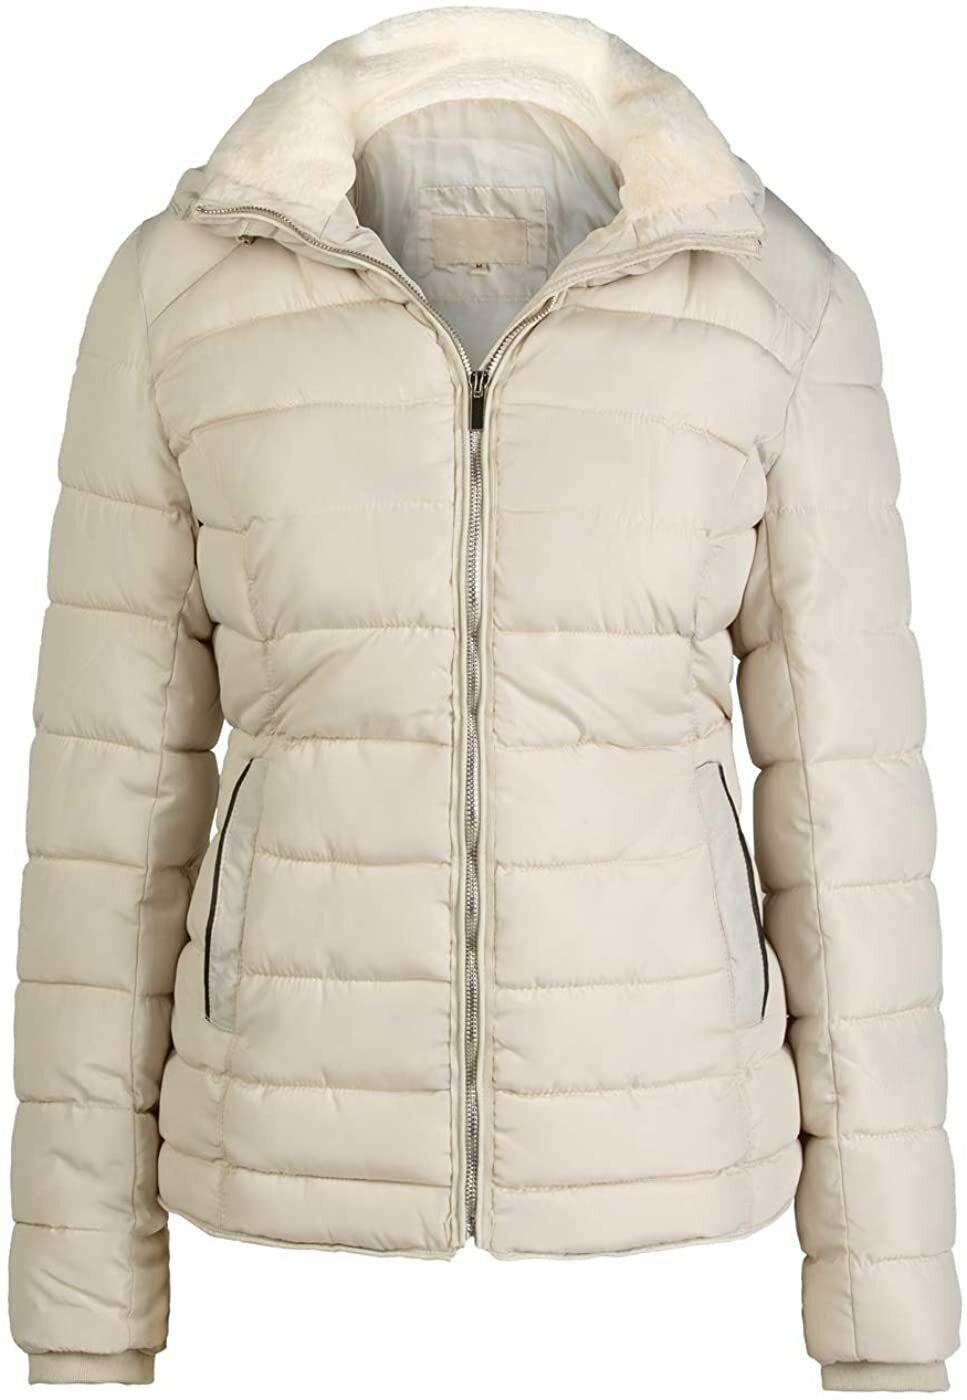 Bellivera Womens Lightweight Puffer Jacket Warm Coat Hooded with Fur Collar